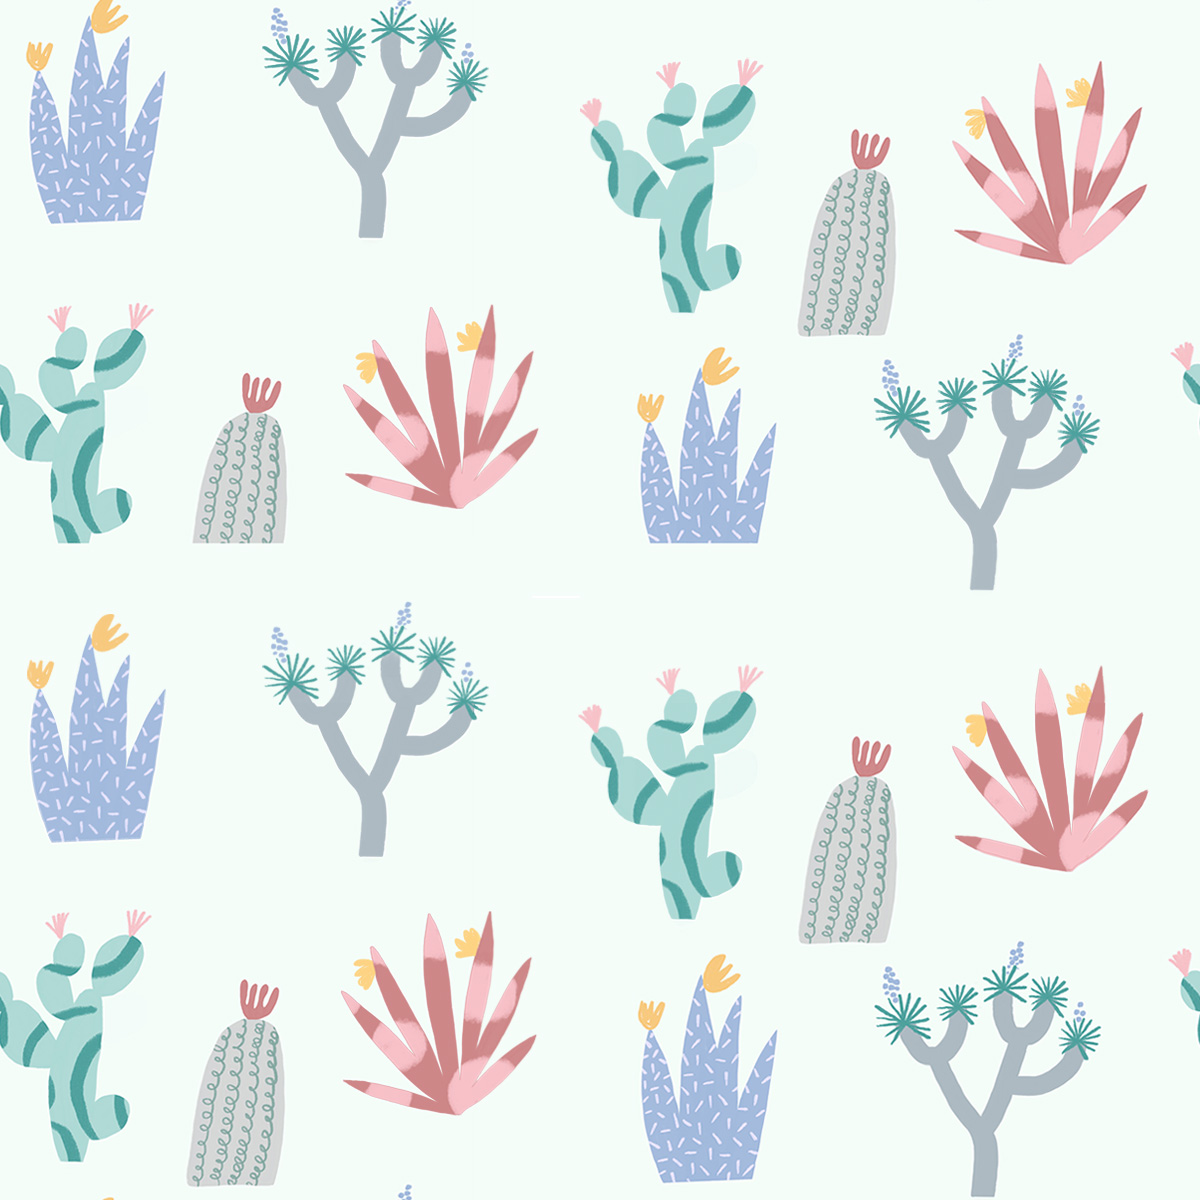 Cactus_Flower-techrepeat copy.jpg